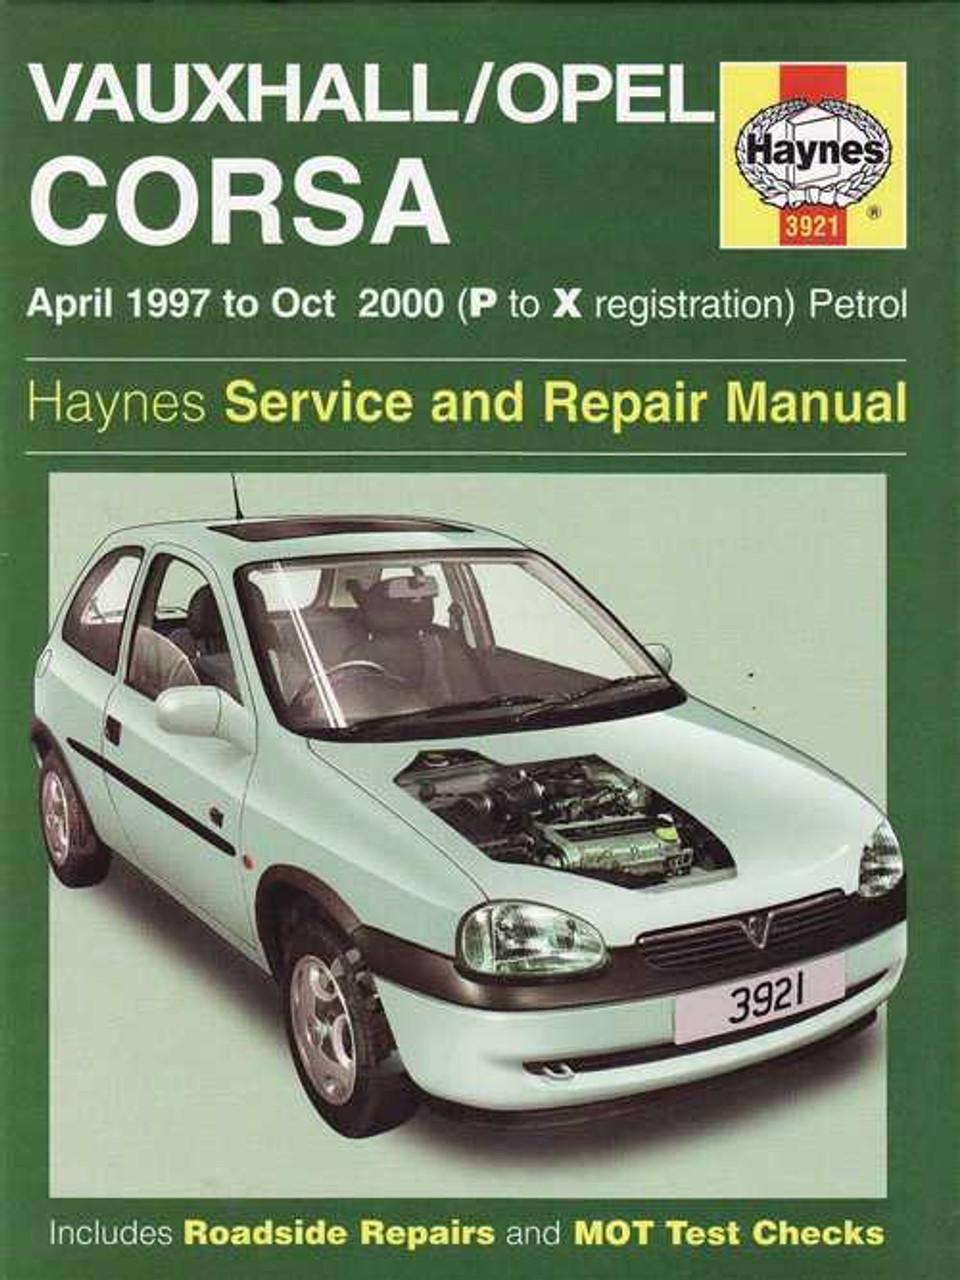 holden barina vauxhall opel corsa petrol 1997 2000 workshop manual rh automotobookshop com au Holden Barina Spark 2014 Holden Barina